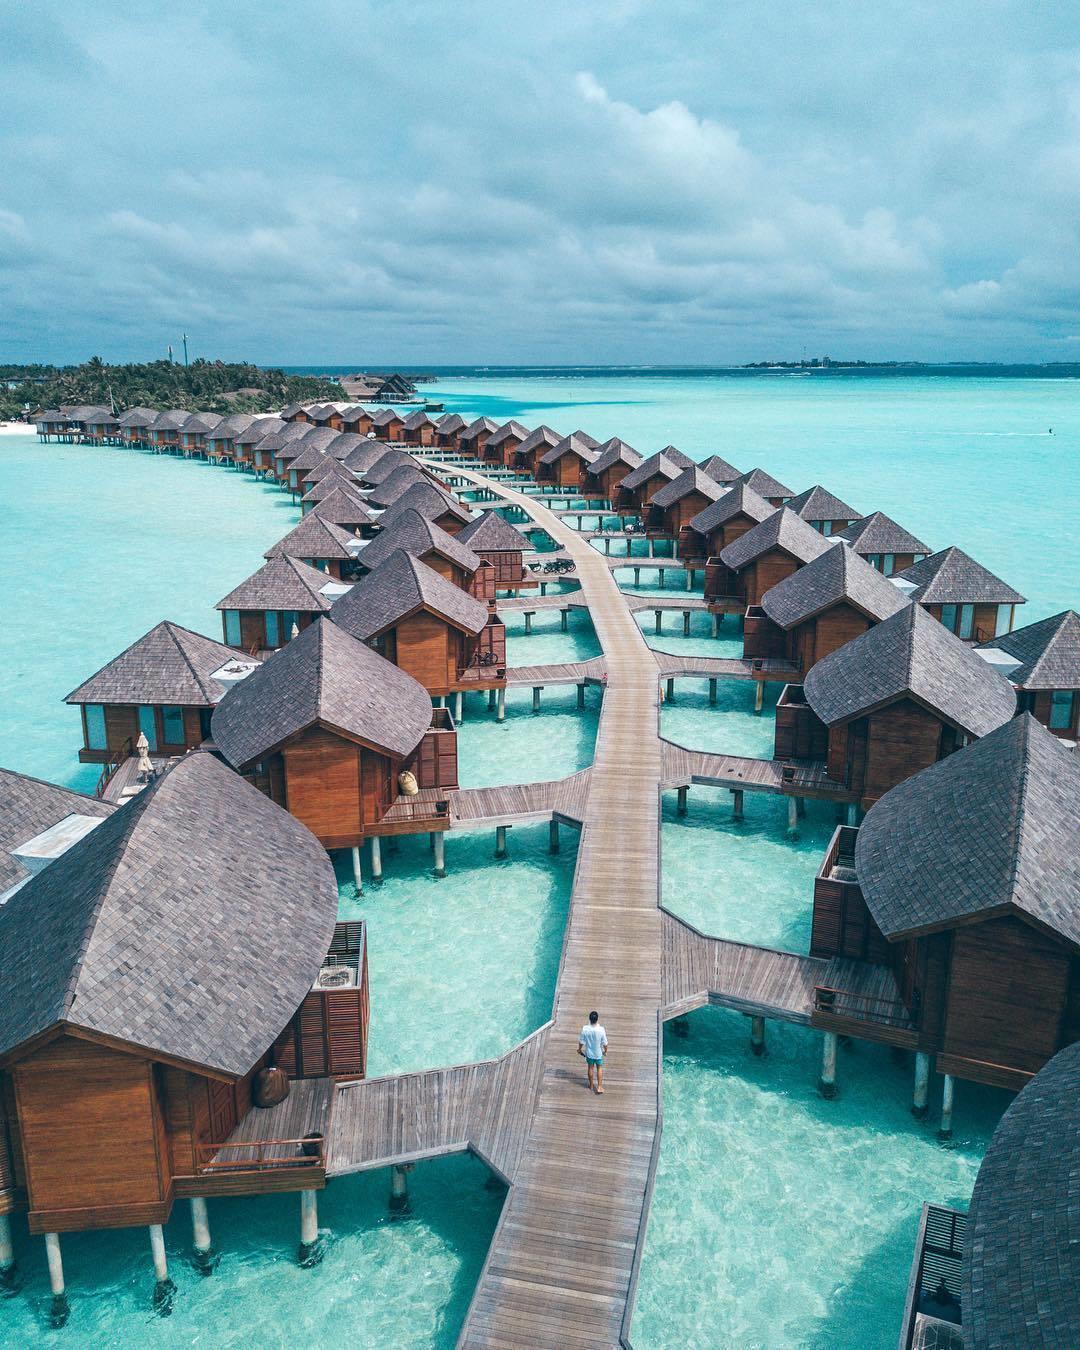 Ảnh: @maldives_ig